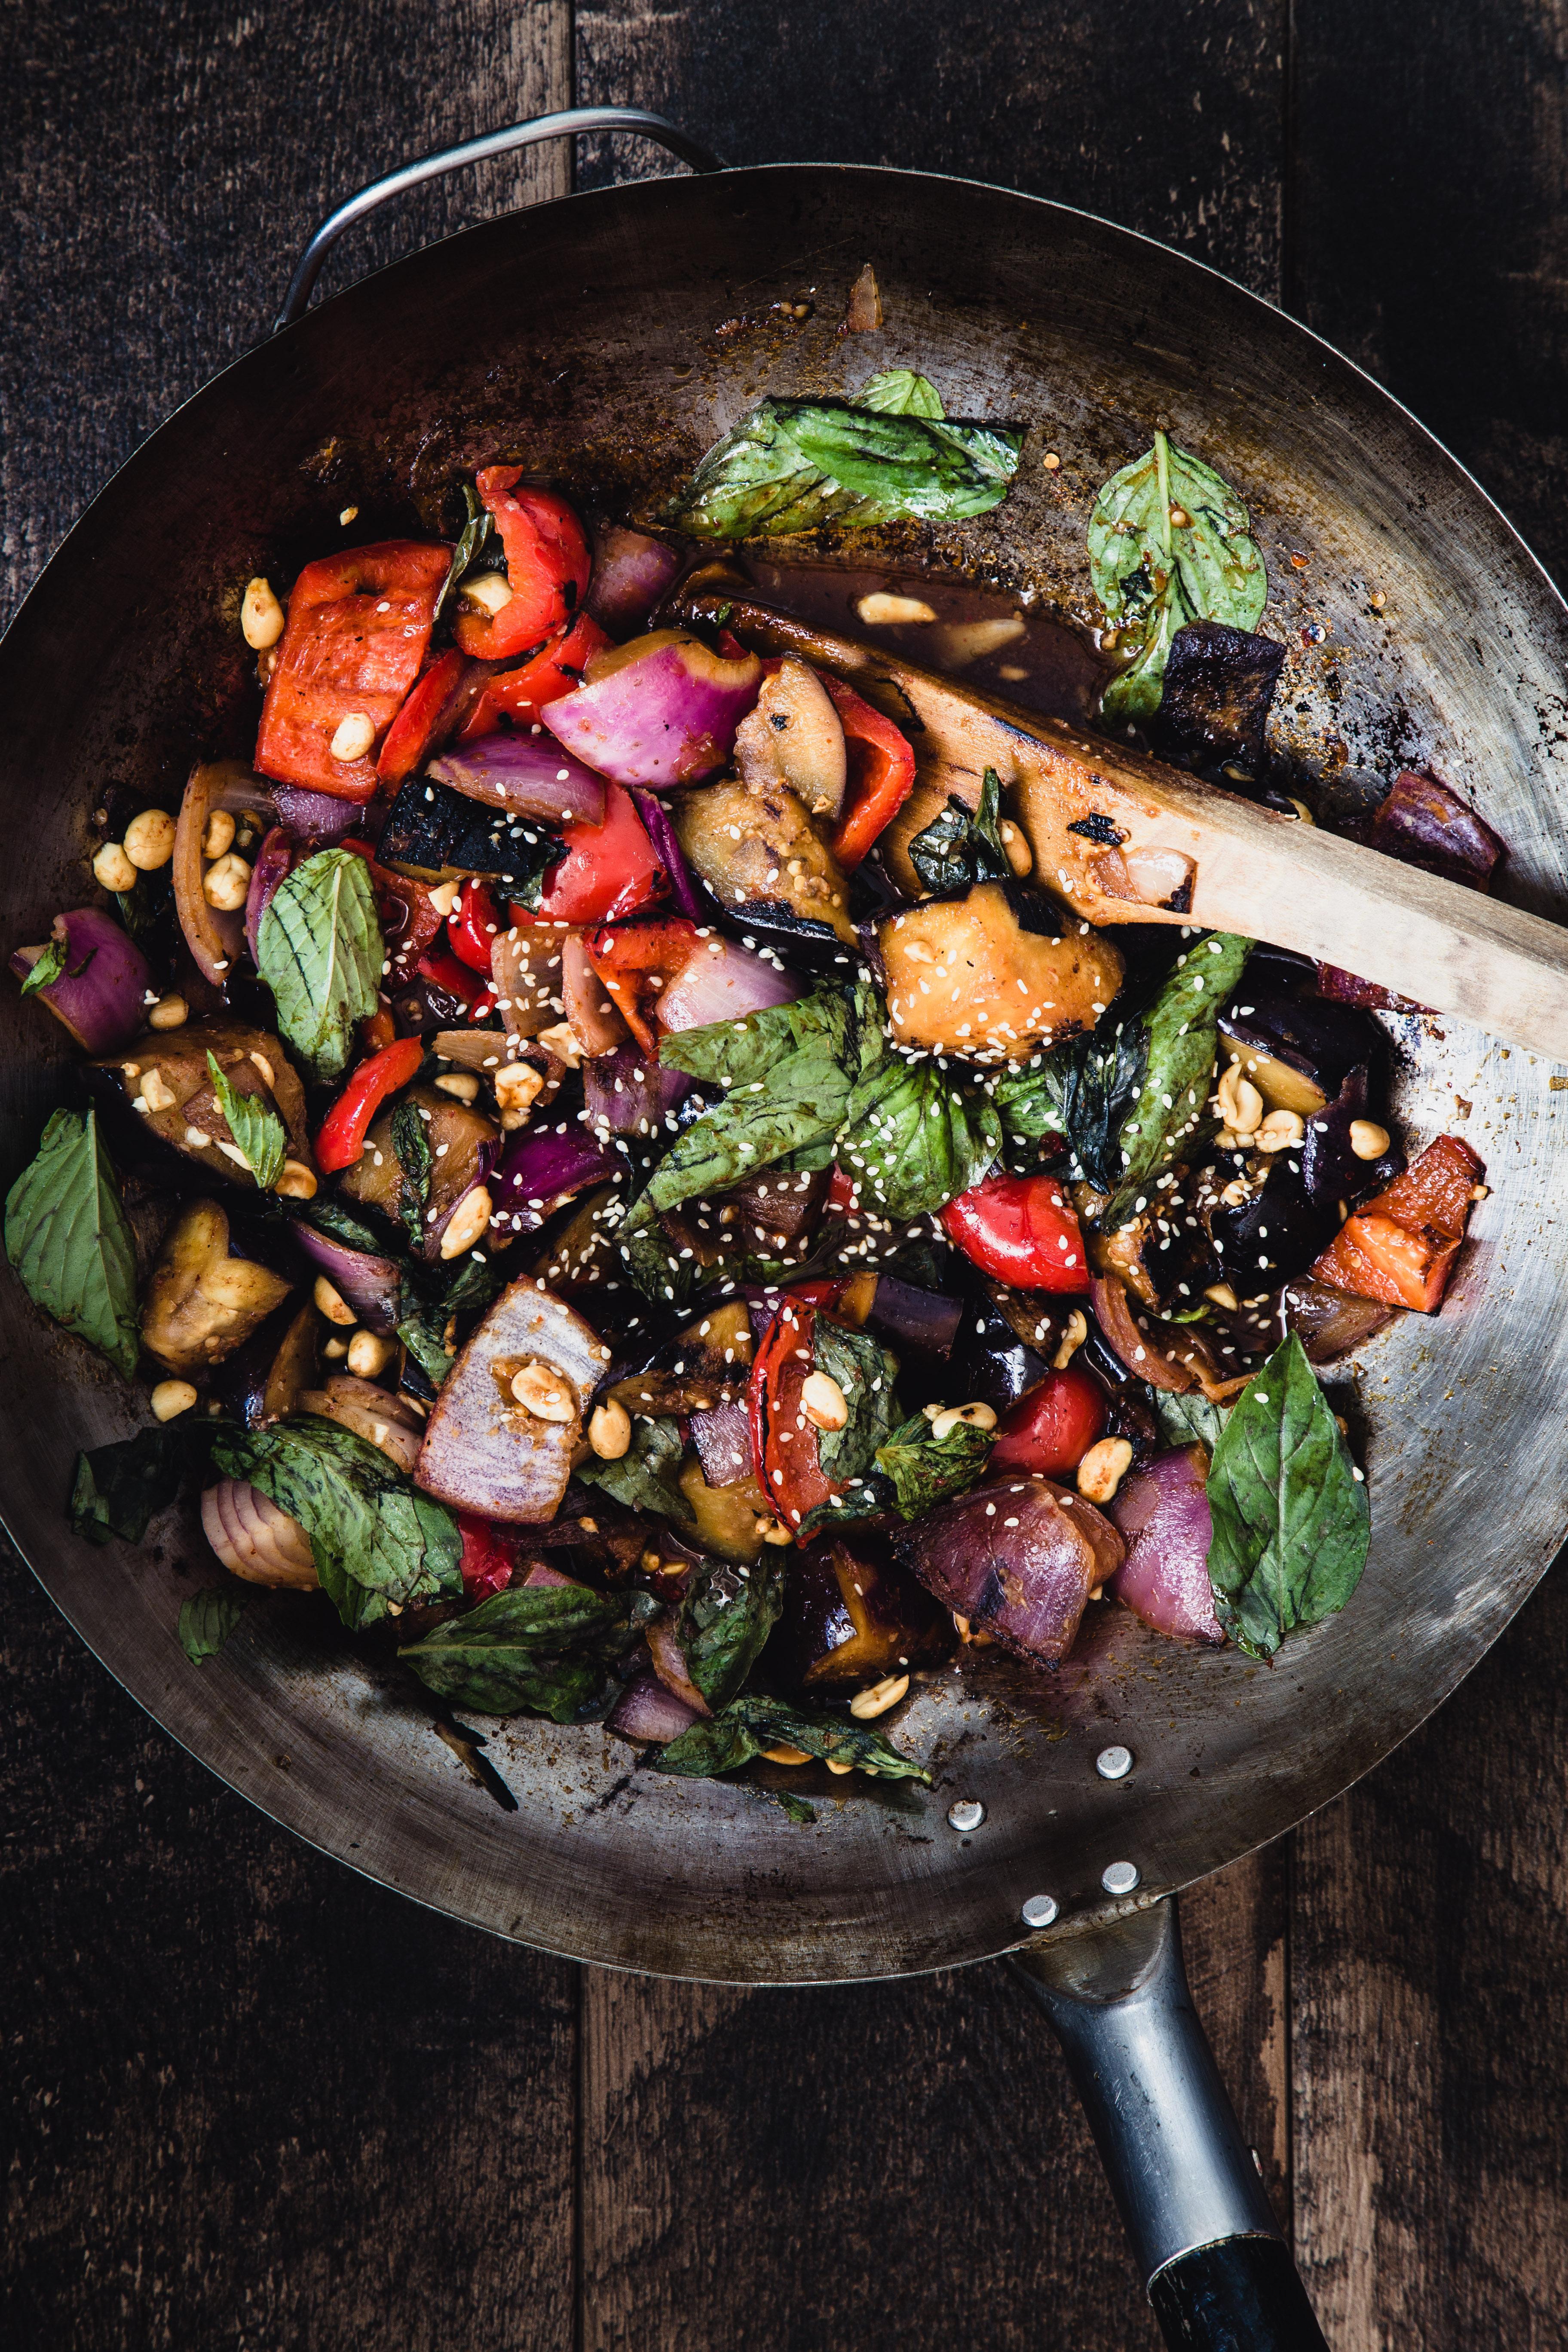 Vegetable Casserole Recipes